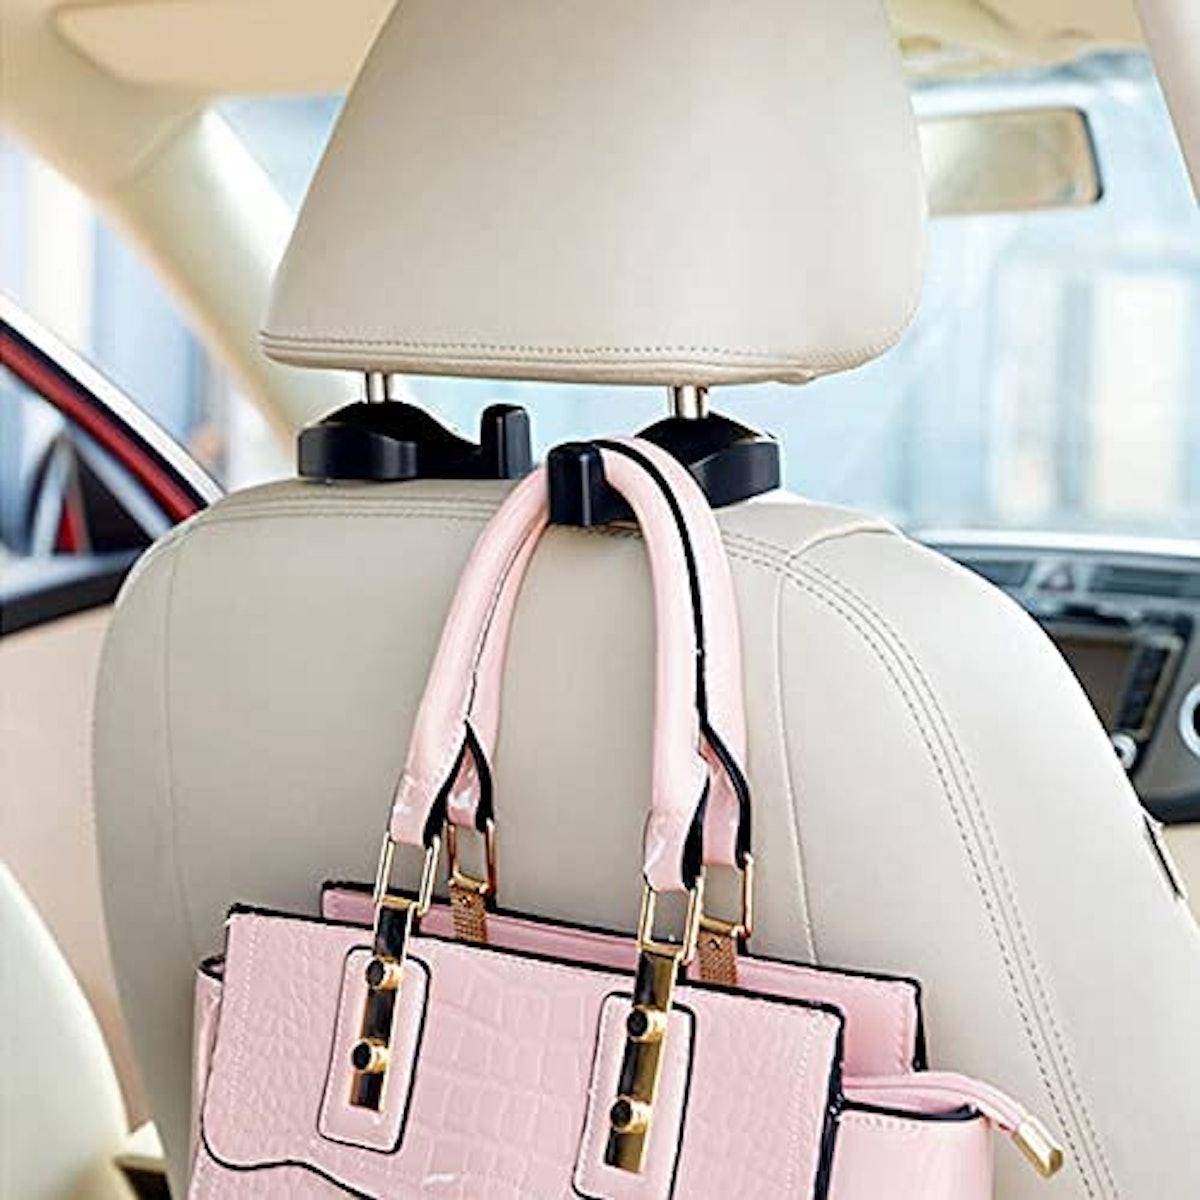 IPELY Universal Car Seat Headrest Hook